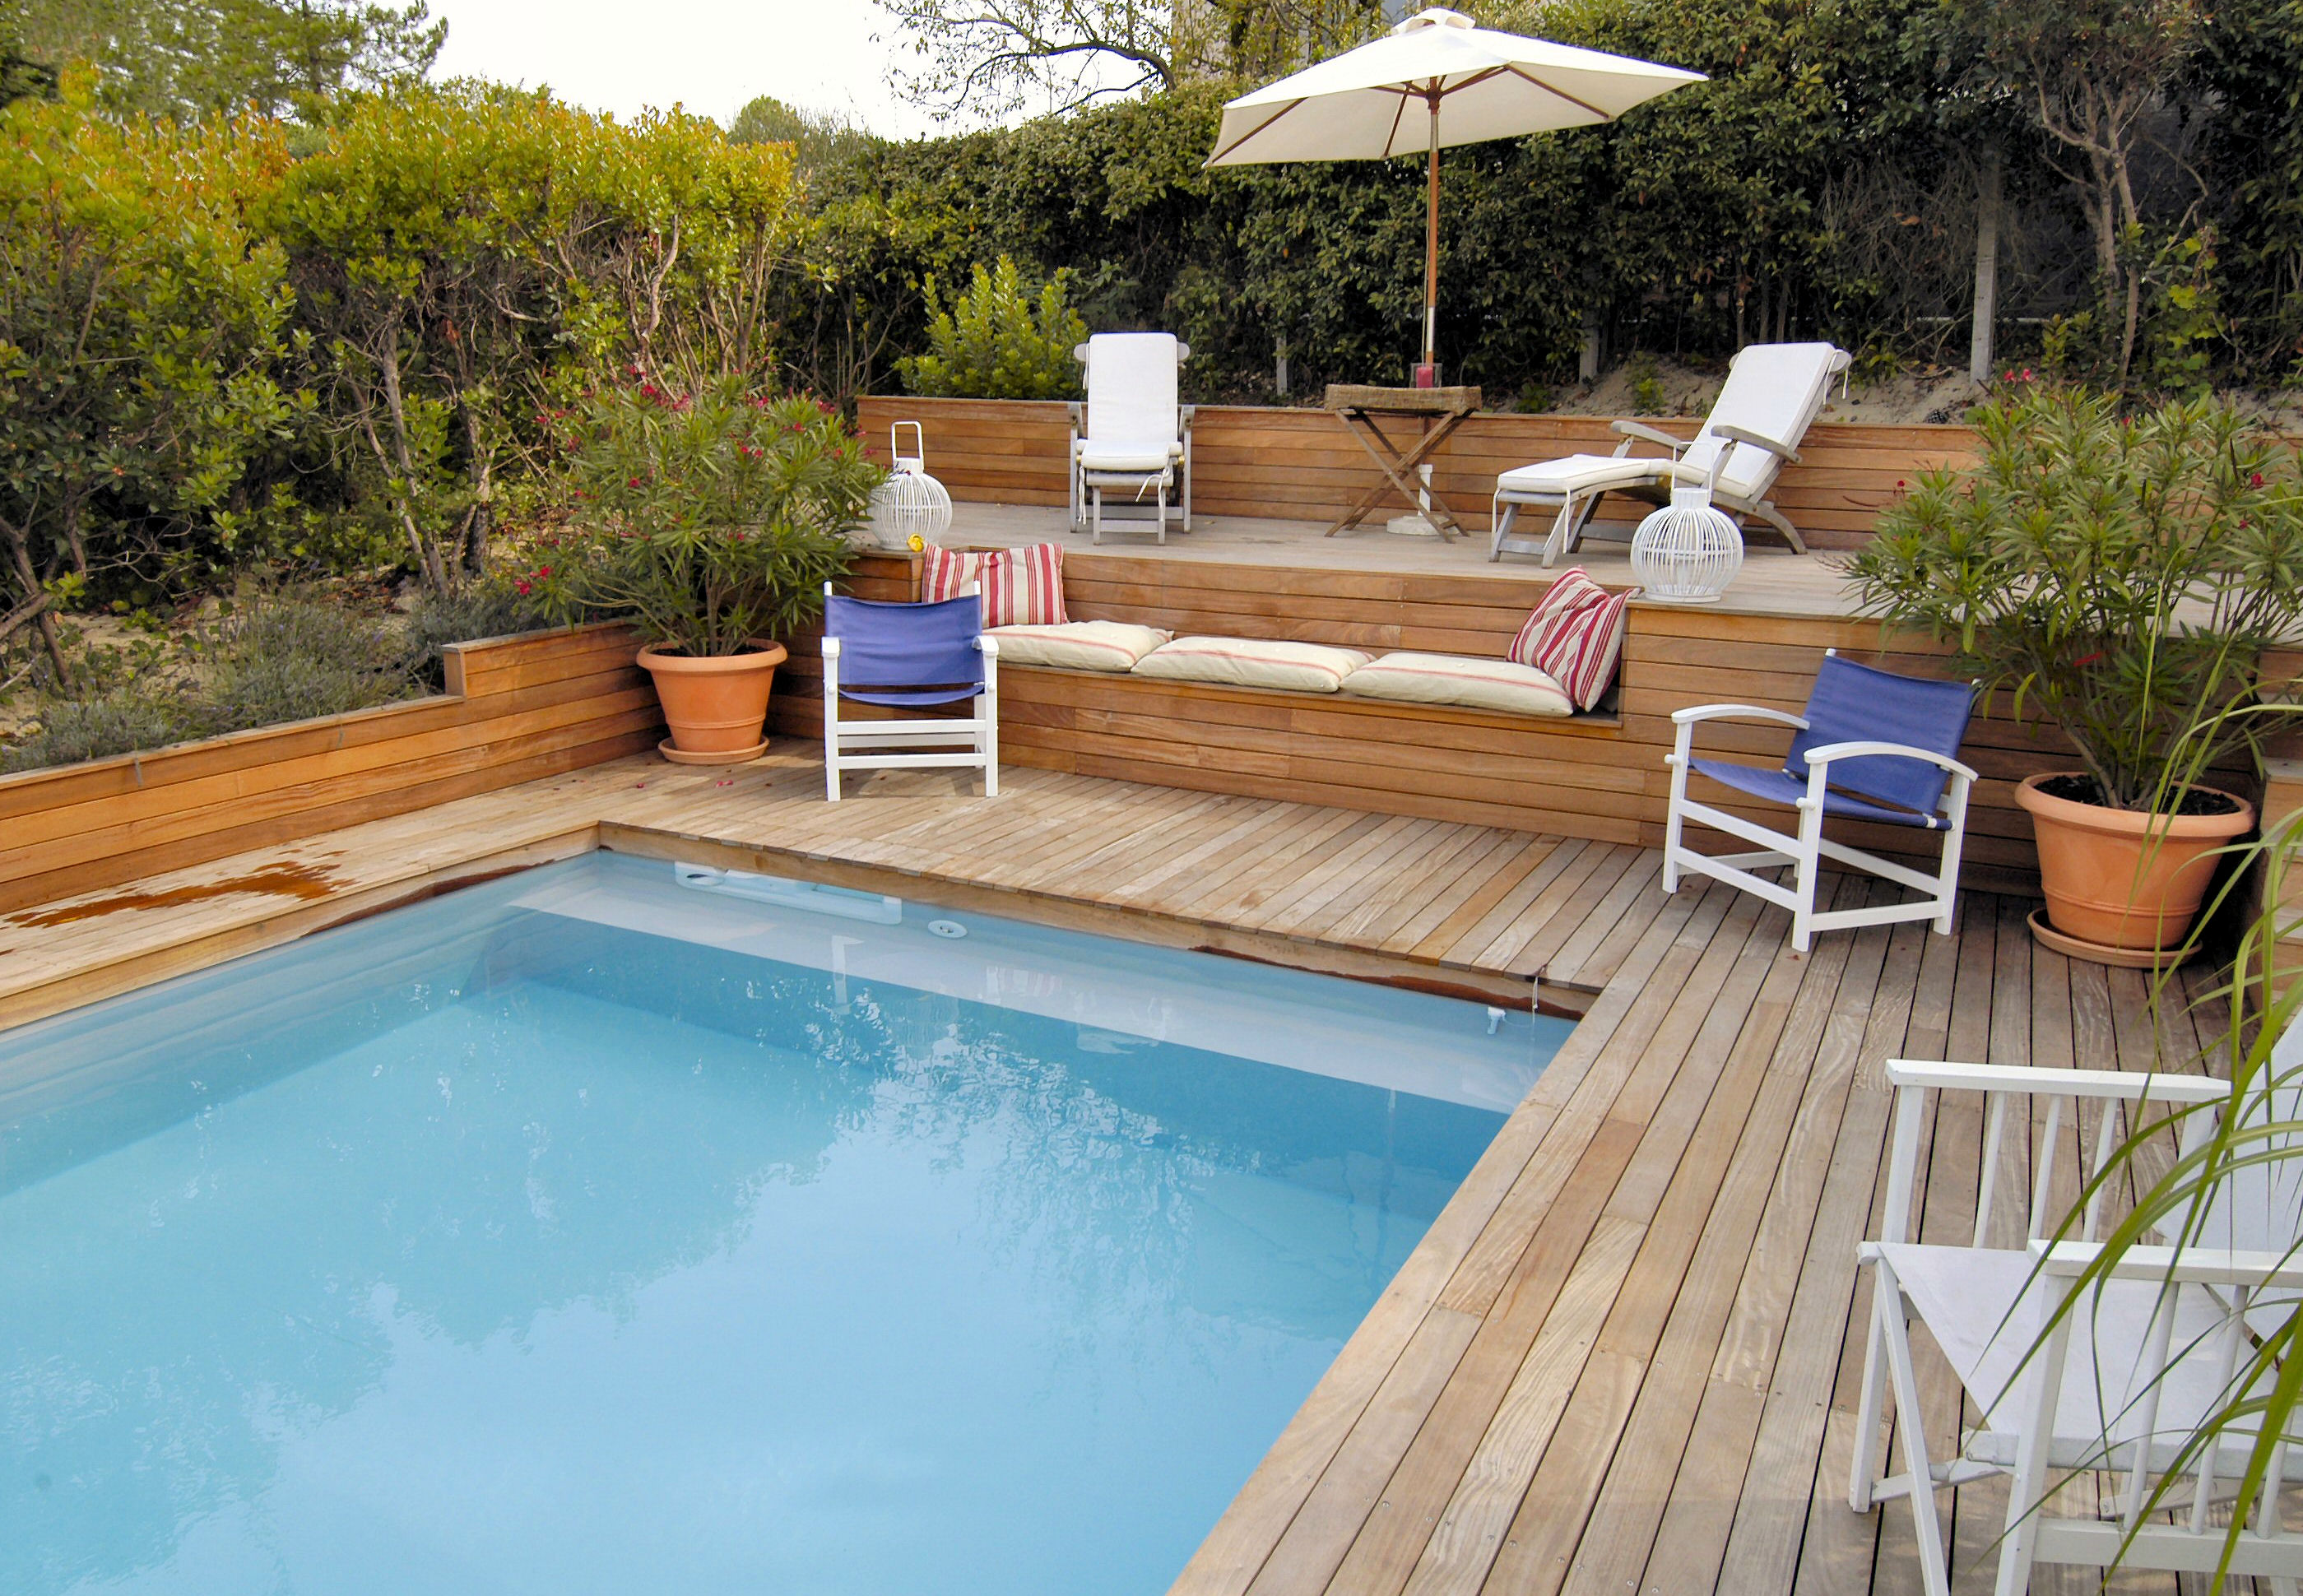 Terrasse piscine semi enterree - Amenagement terrasse piscine ...